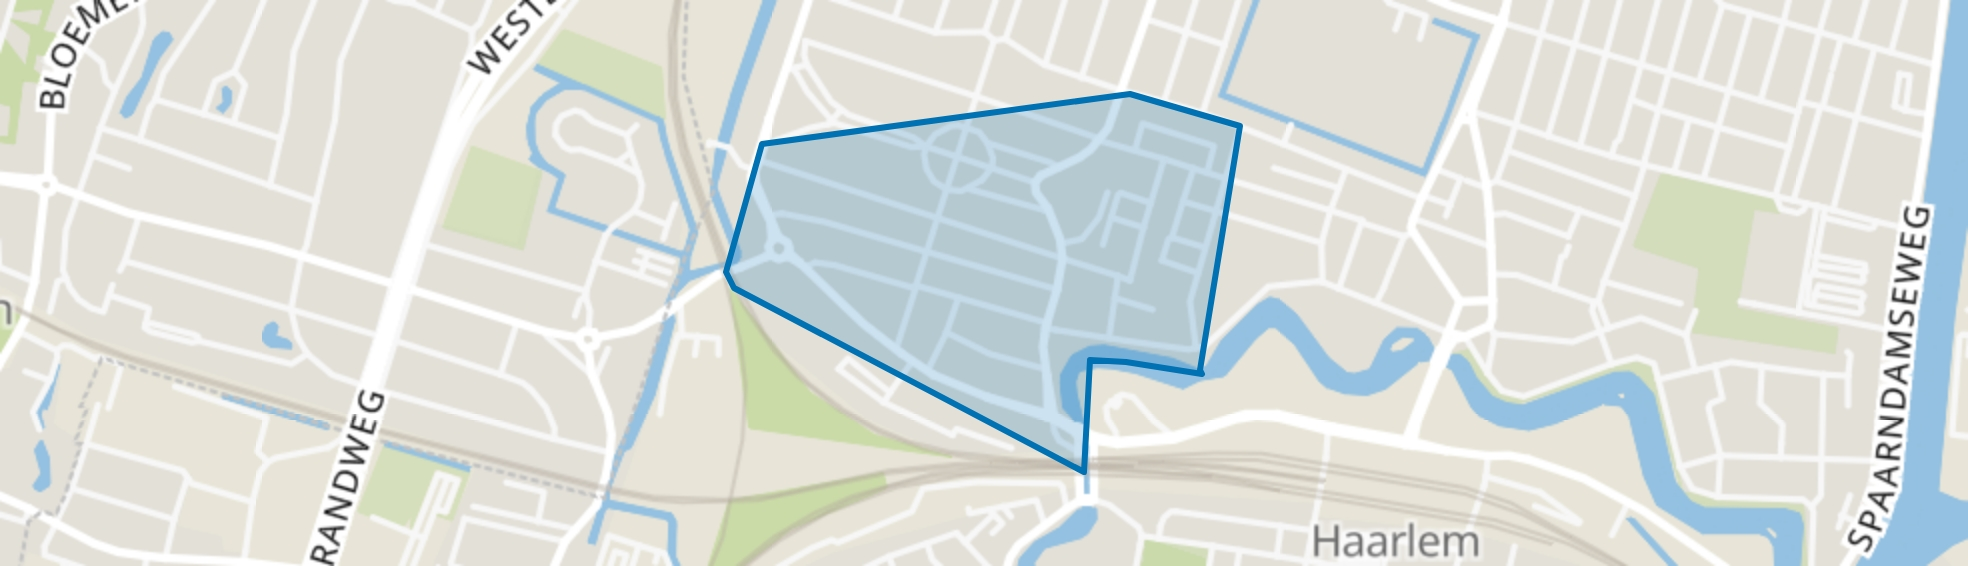 Kleverpark-zuid, Haarlem map